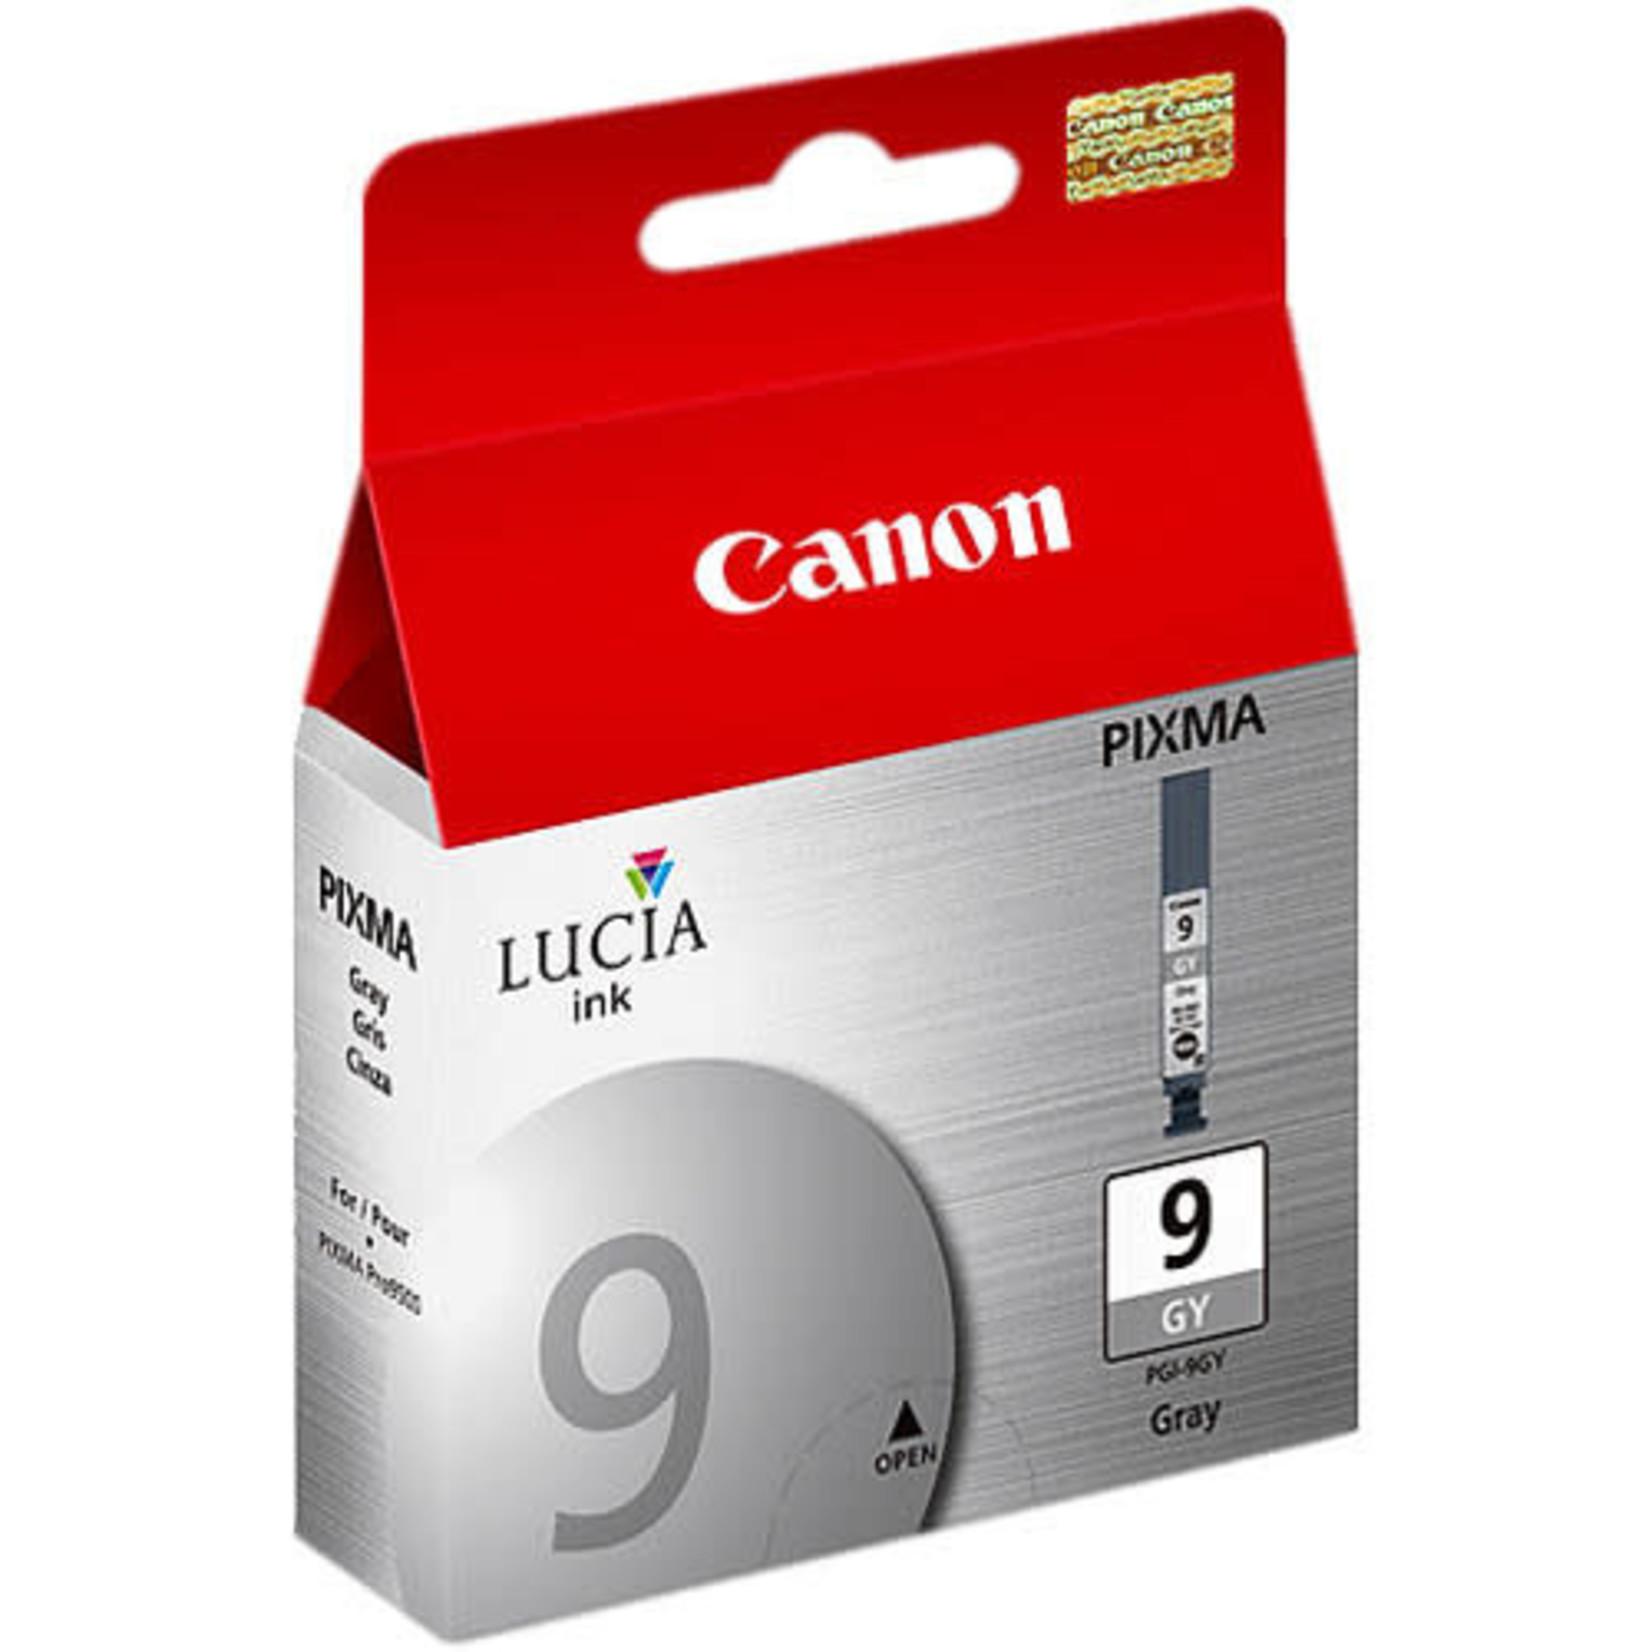 Canon Canon LUCIA PGI-9 Gray Ink Tank